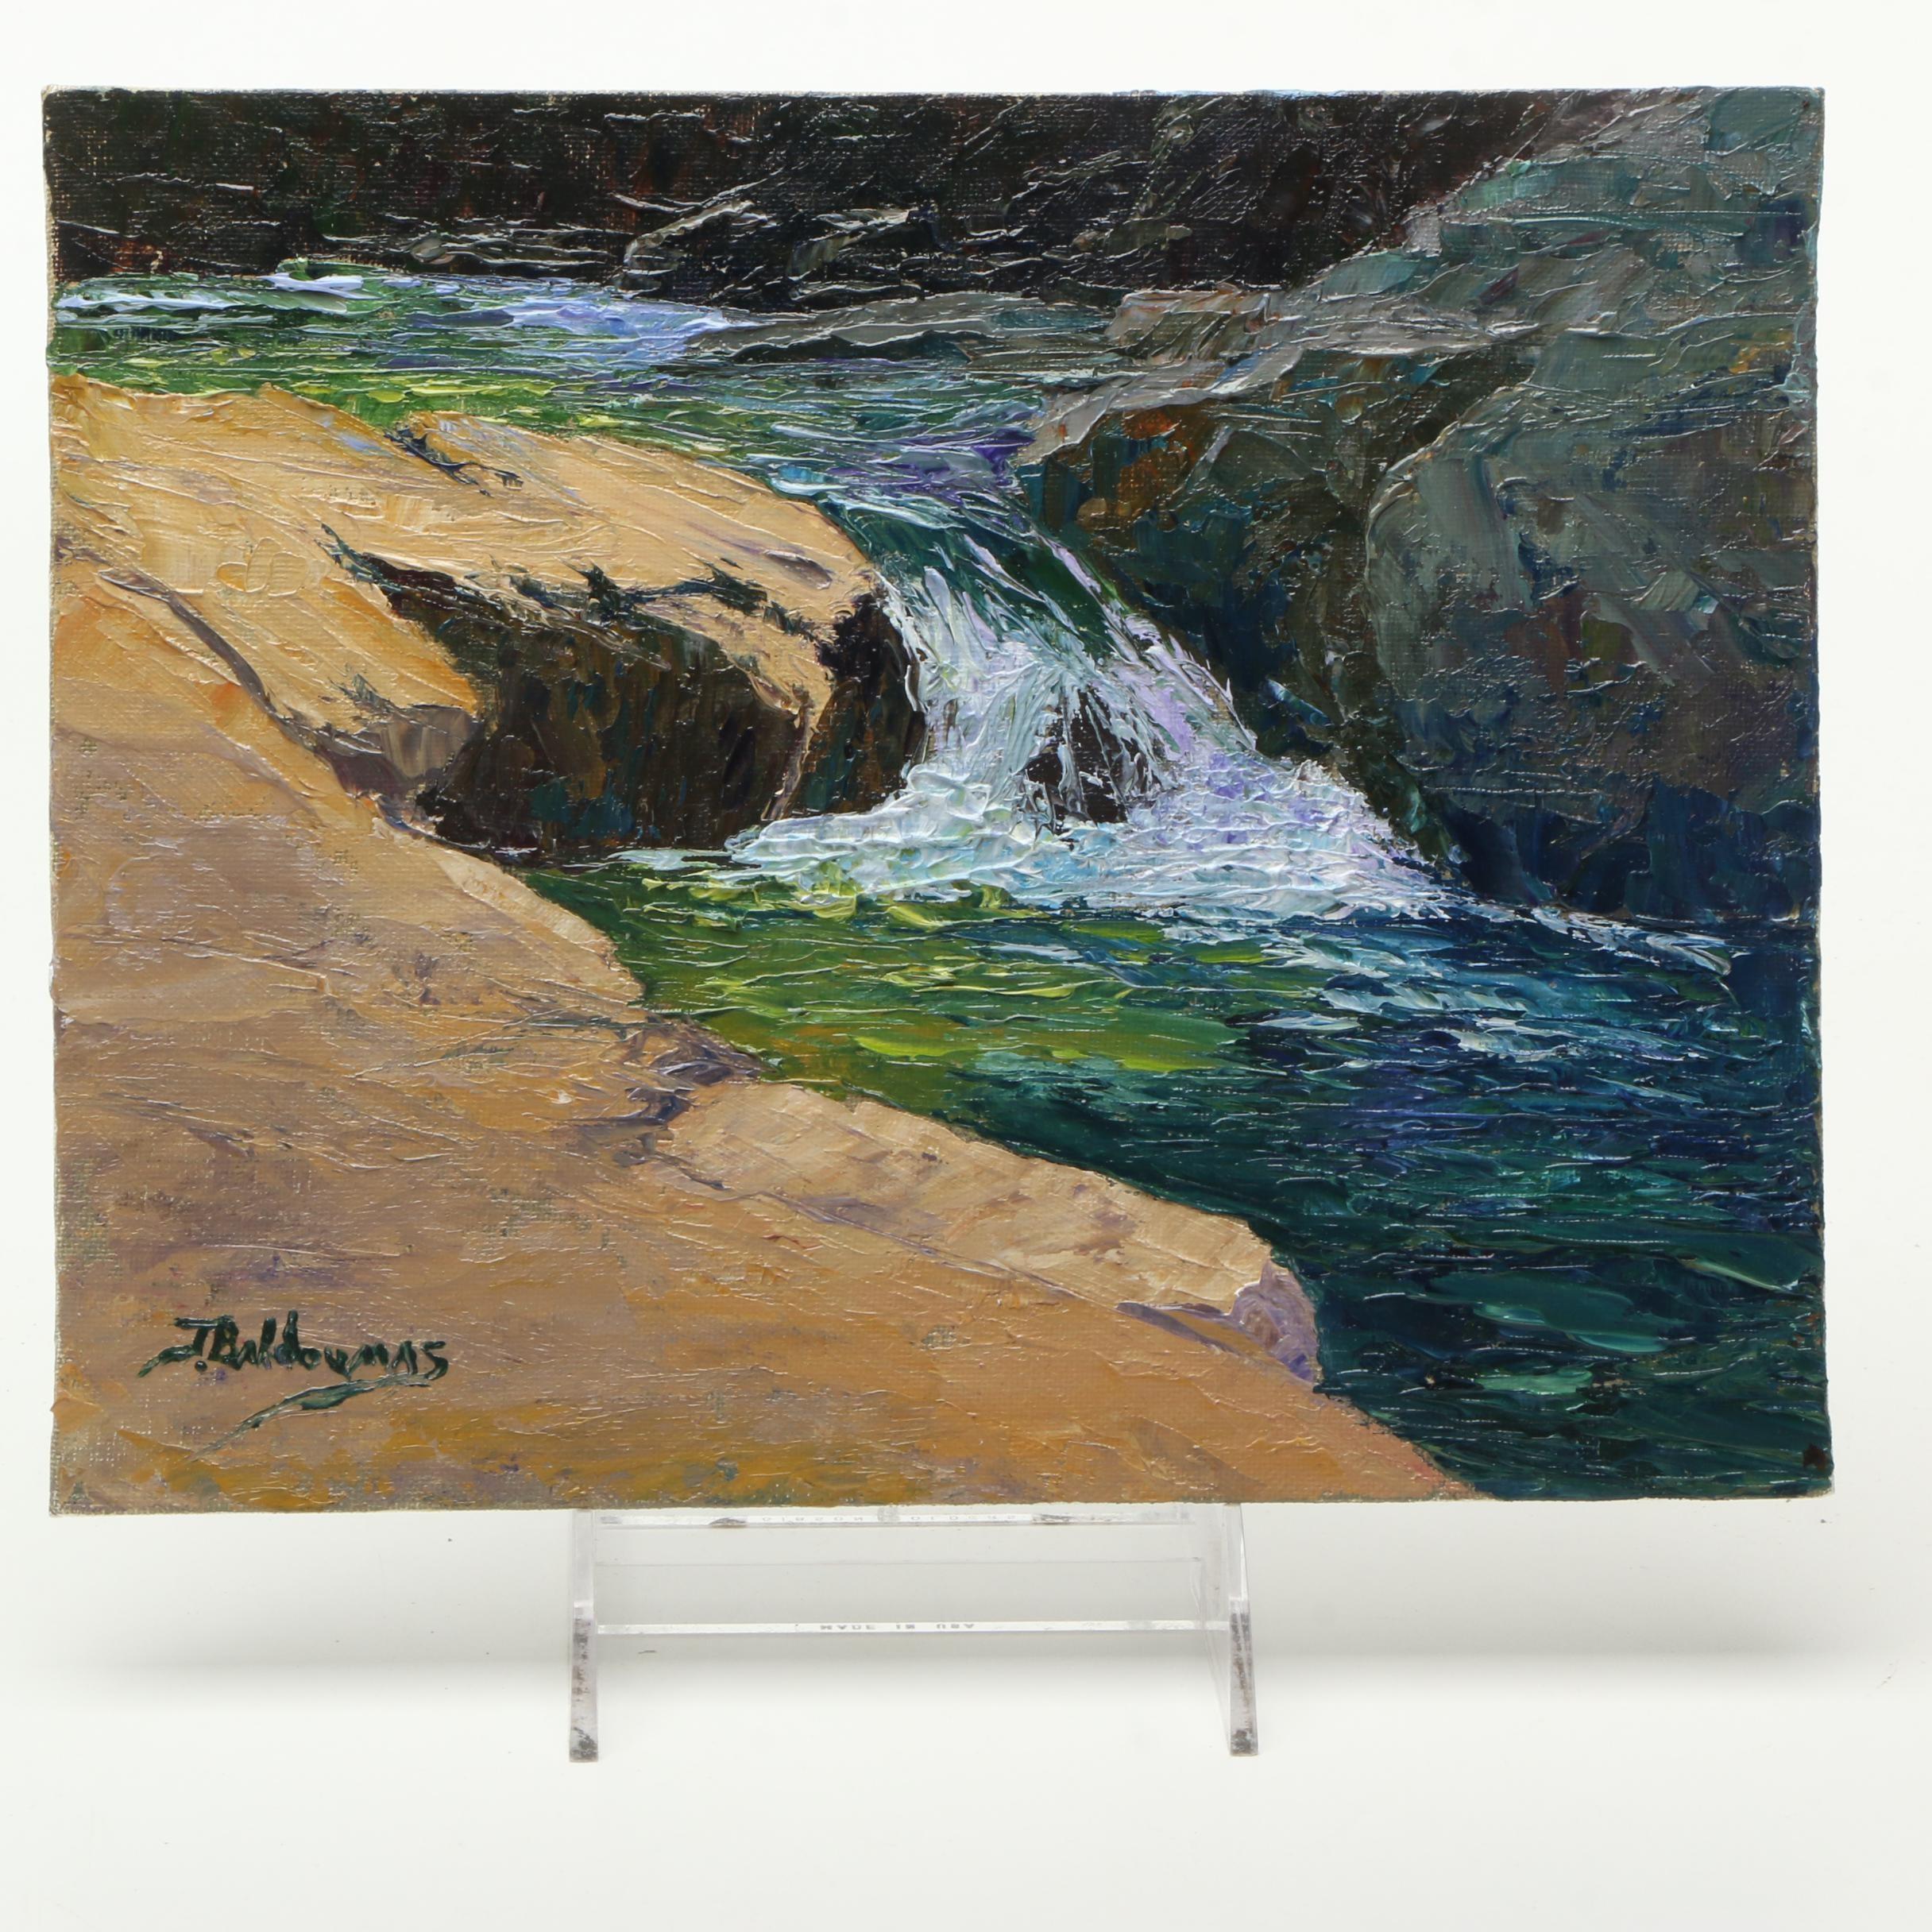 James Baldoumas Oil on Canvas Board Painting 'Lower Falls'